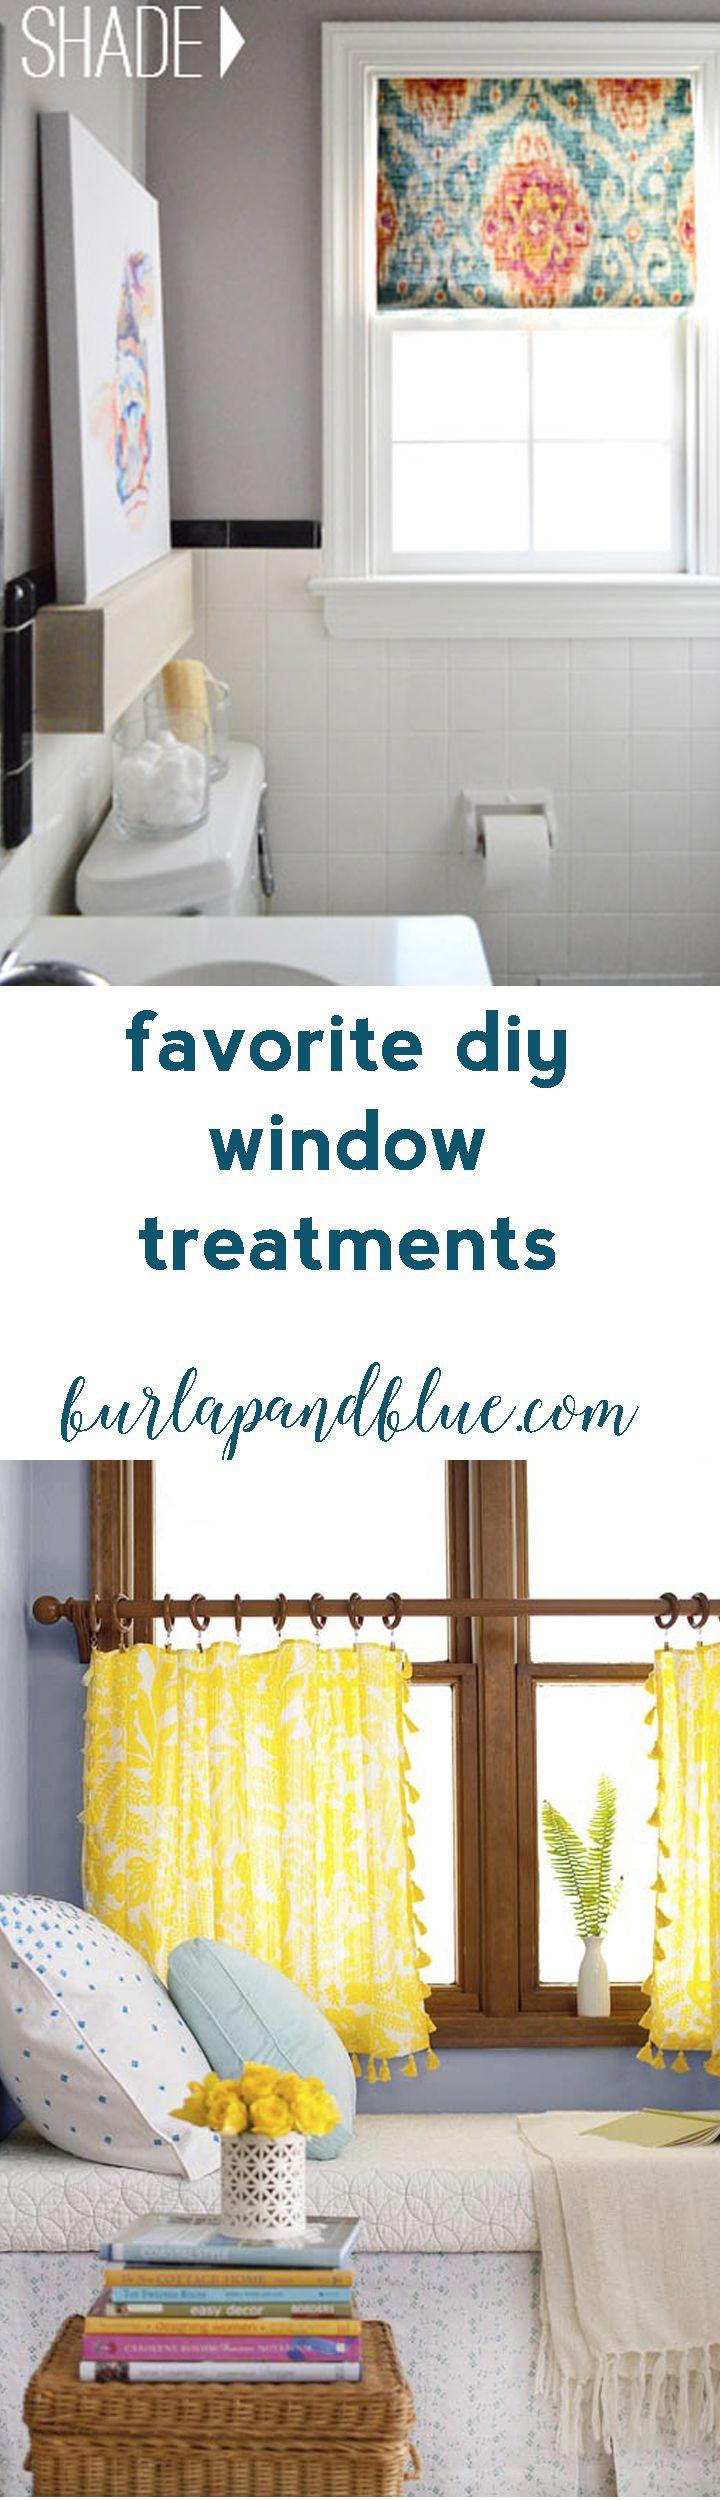 Window decor diy   favorite window treatment tutorials  window tutorials and craft